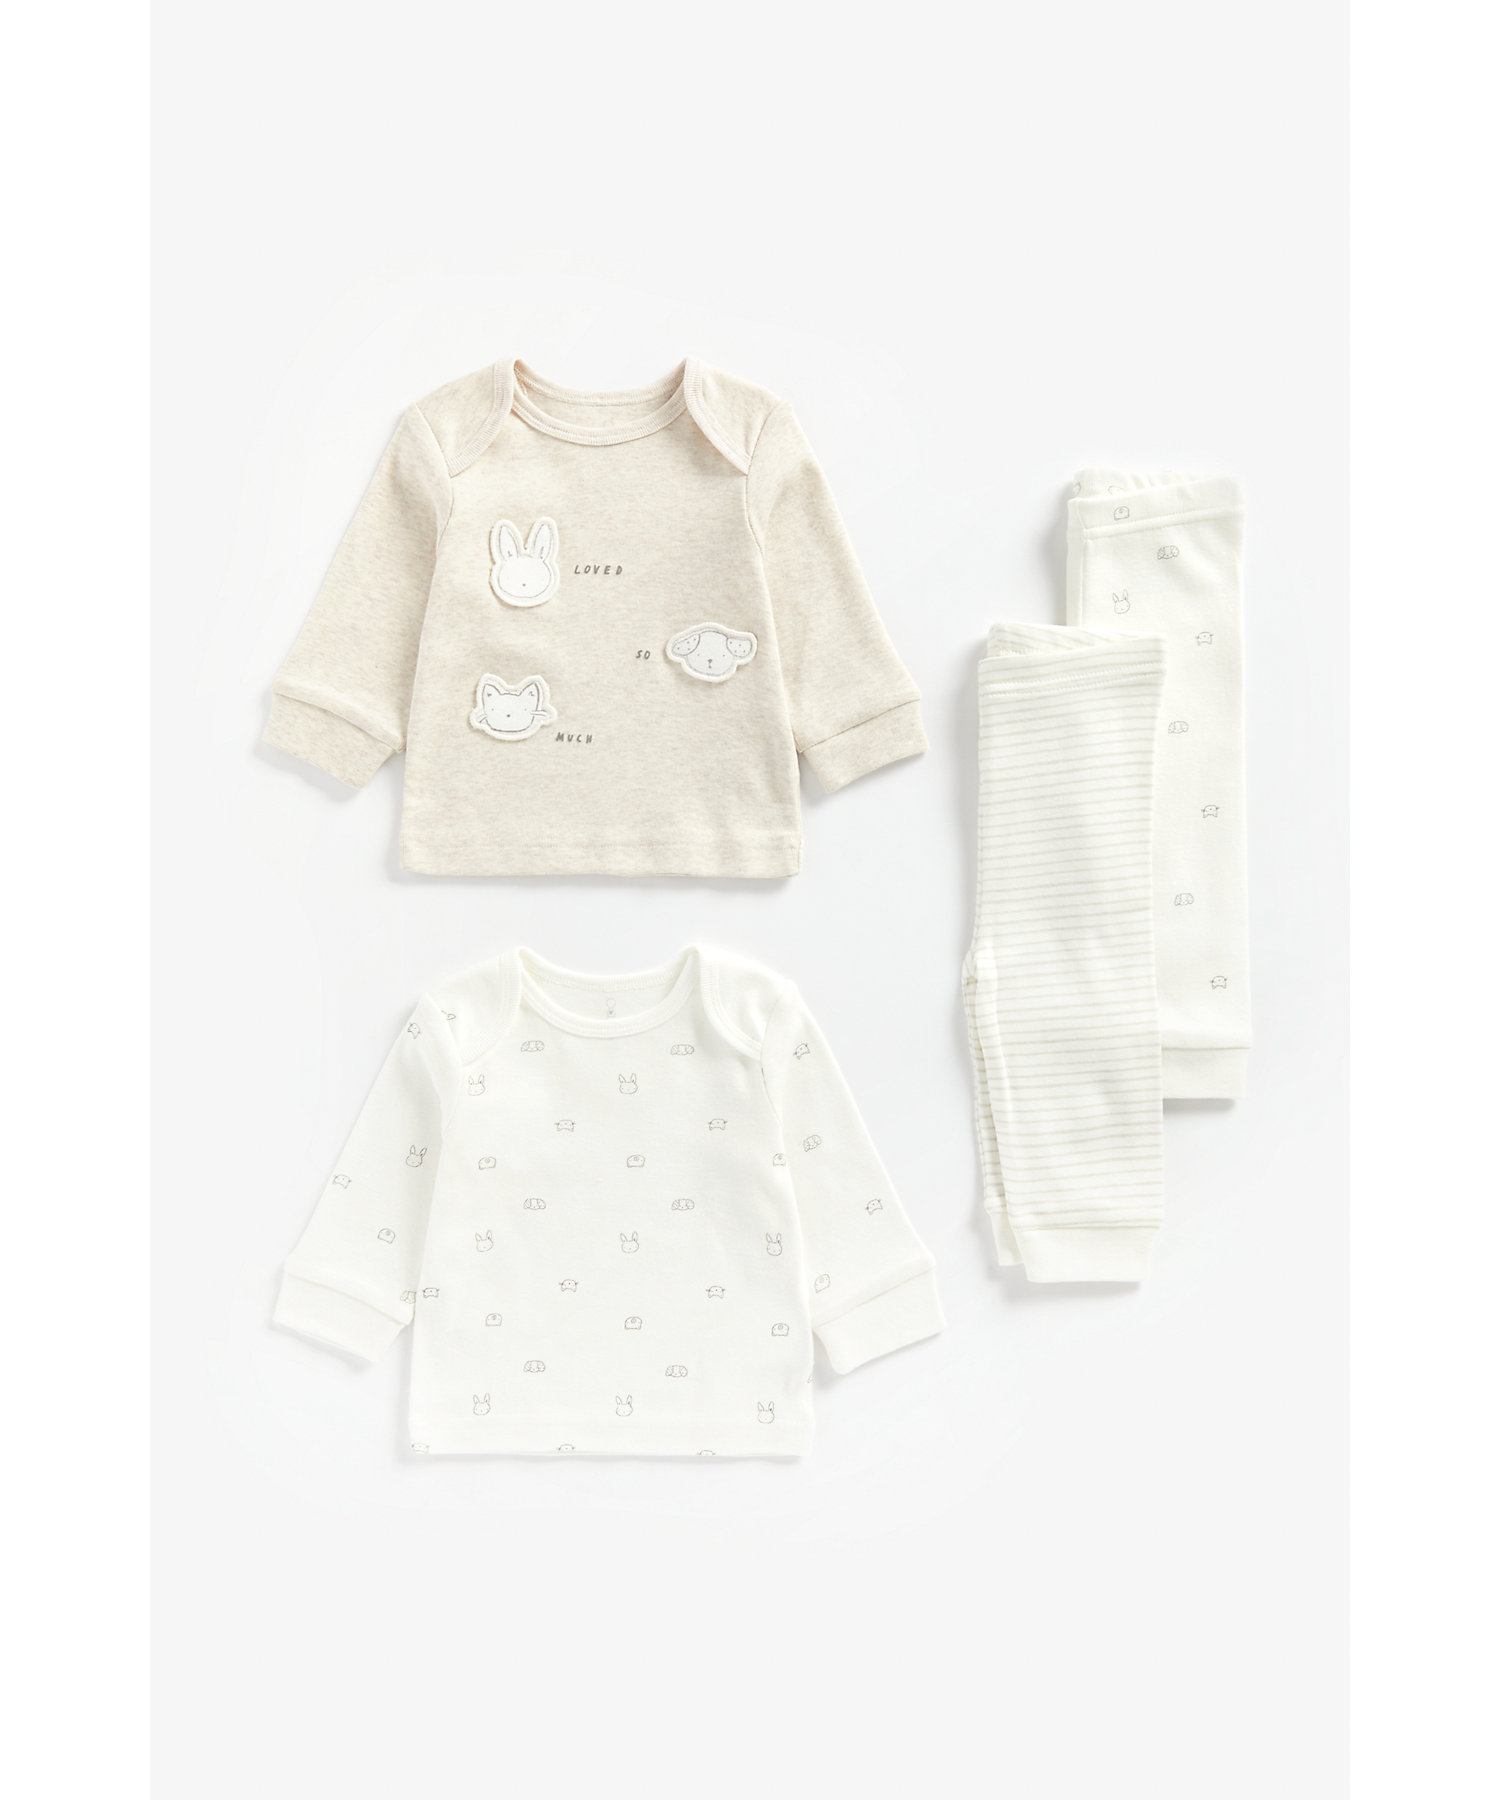 Mothercare | Unisex Full Sleeves Pyjama Set Animal Face Patchwork - Pack Of 2 - Beige